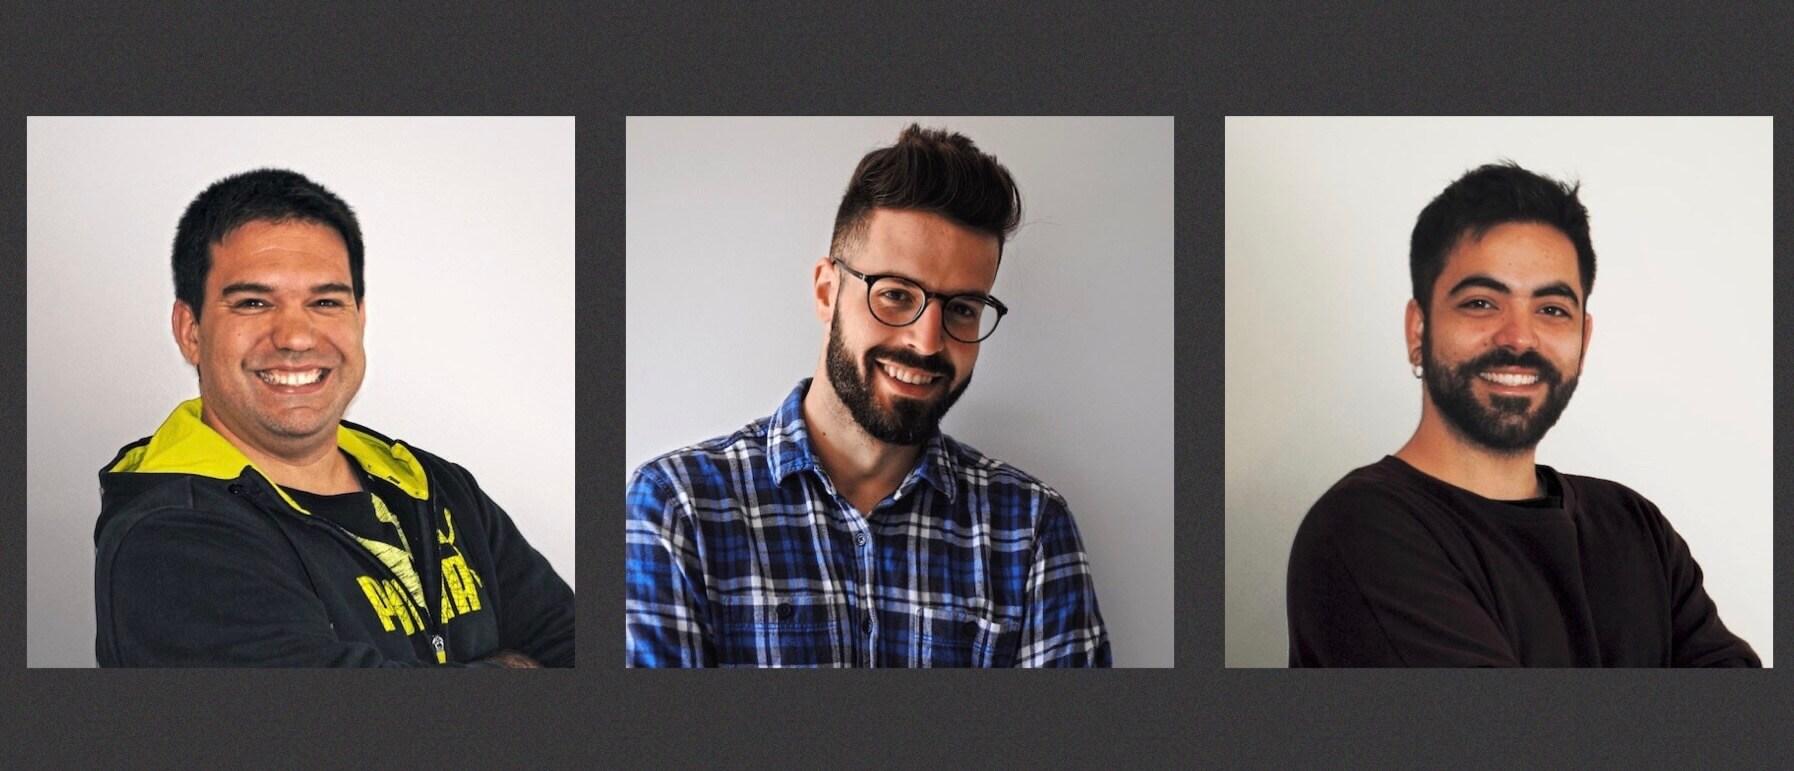 Resta d'equip d'Slowcode: Jordi Masferrer, Joey Masip i Pau Vila.